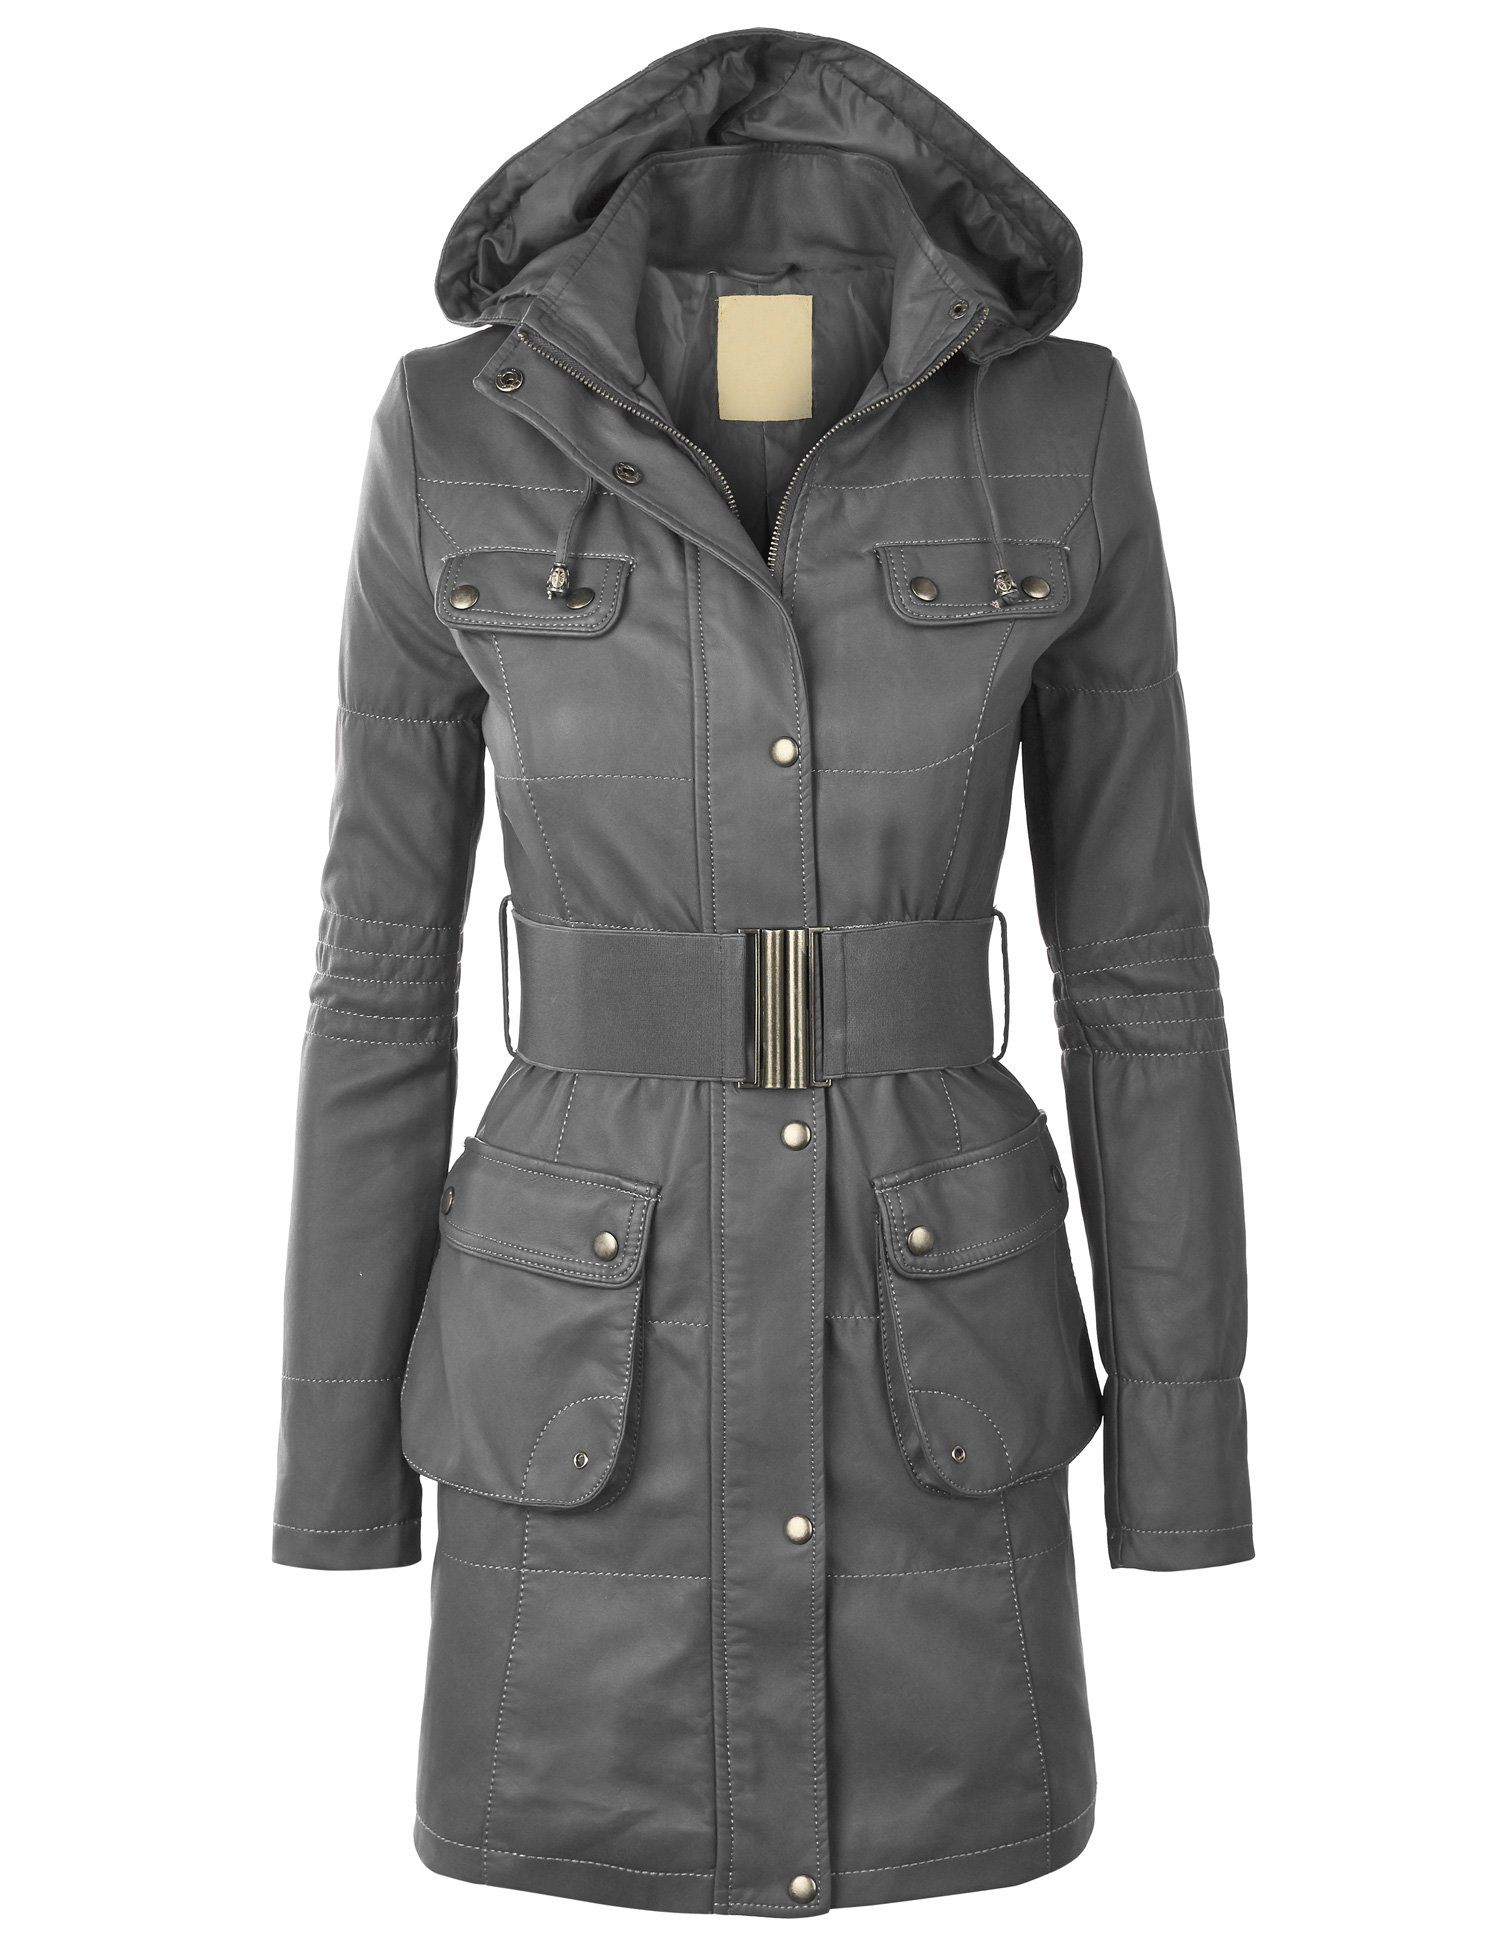 WJC869 Womens Faux Leather Long Coat S GRAY